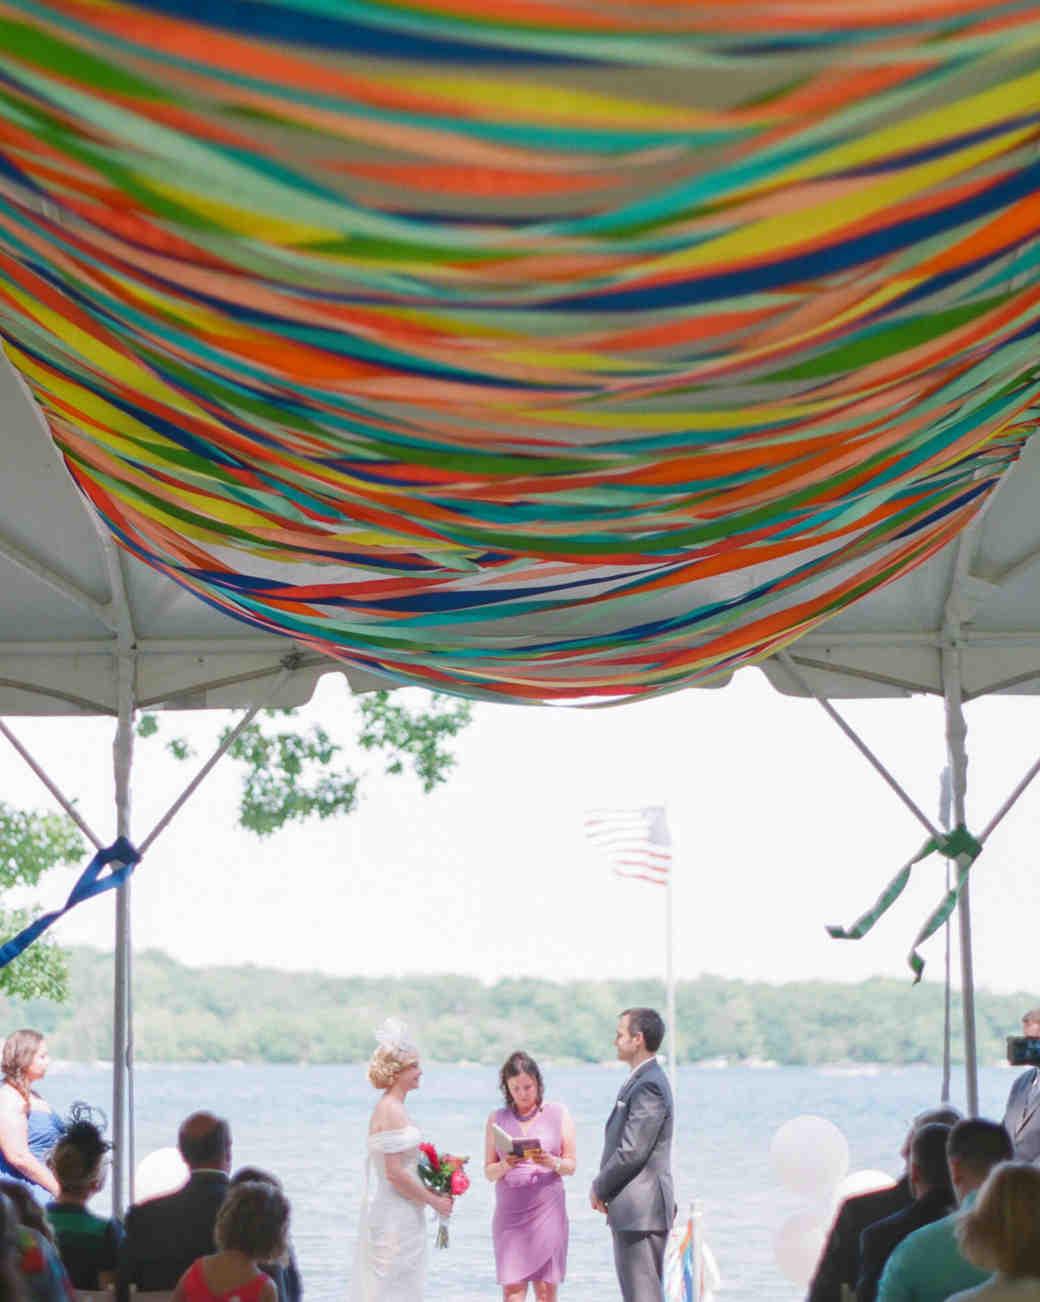 liz-jeff-wedding-ceremony-078-s112303-1115.jpg